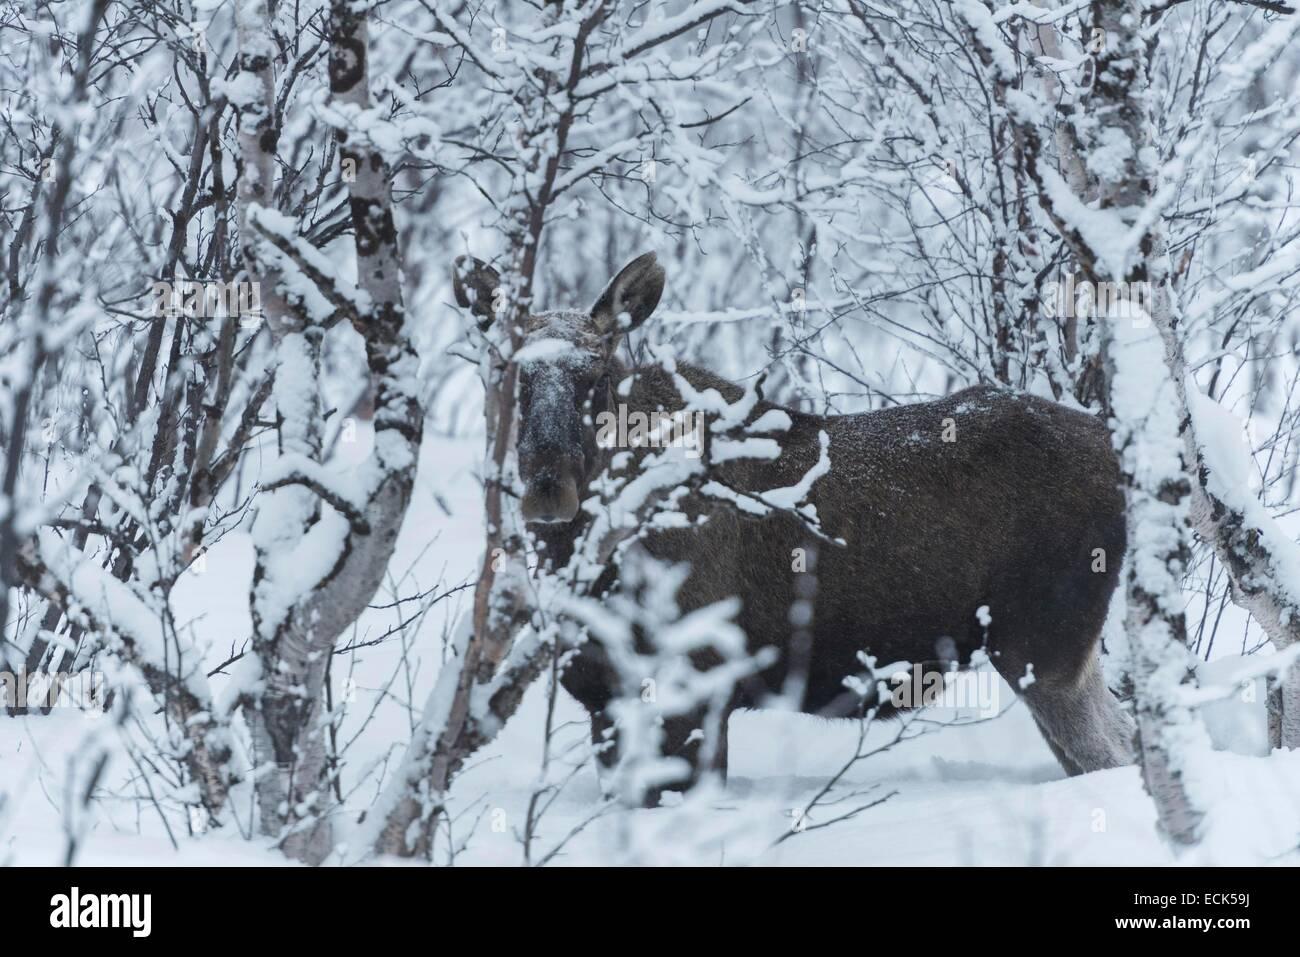 Sweden, Lapland, Norrbotten, GΣllivare, Moose in Swedish Lapland near Nikkaluokta - Stock Image